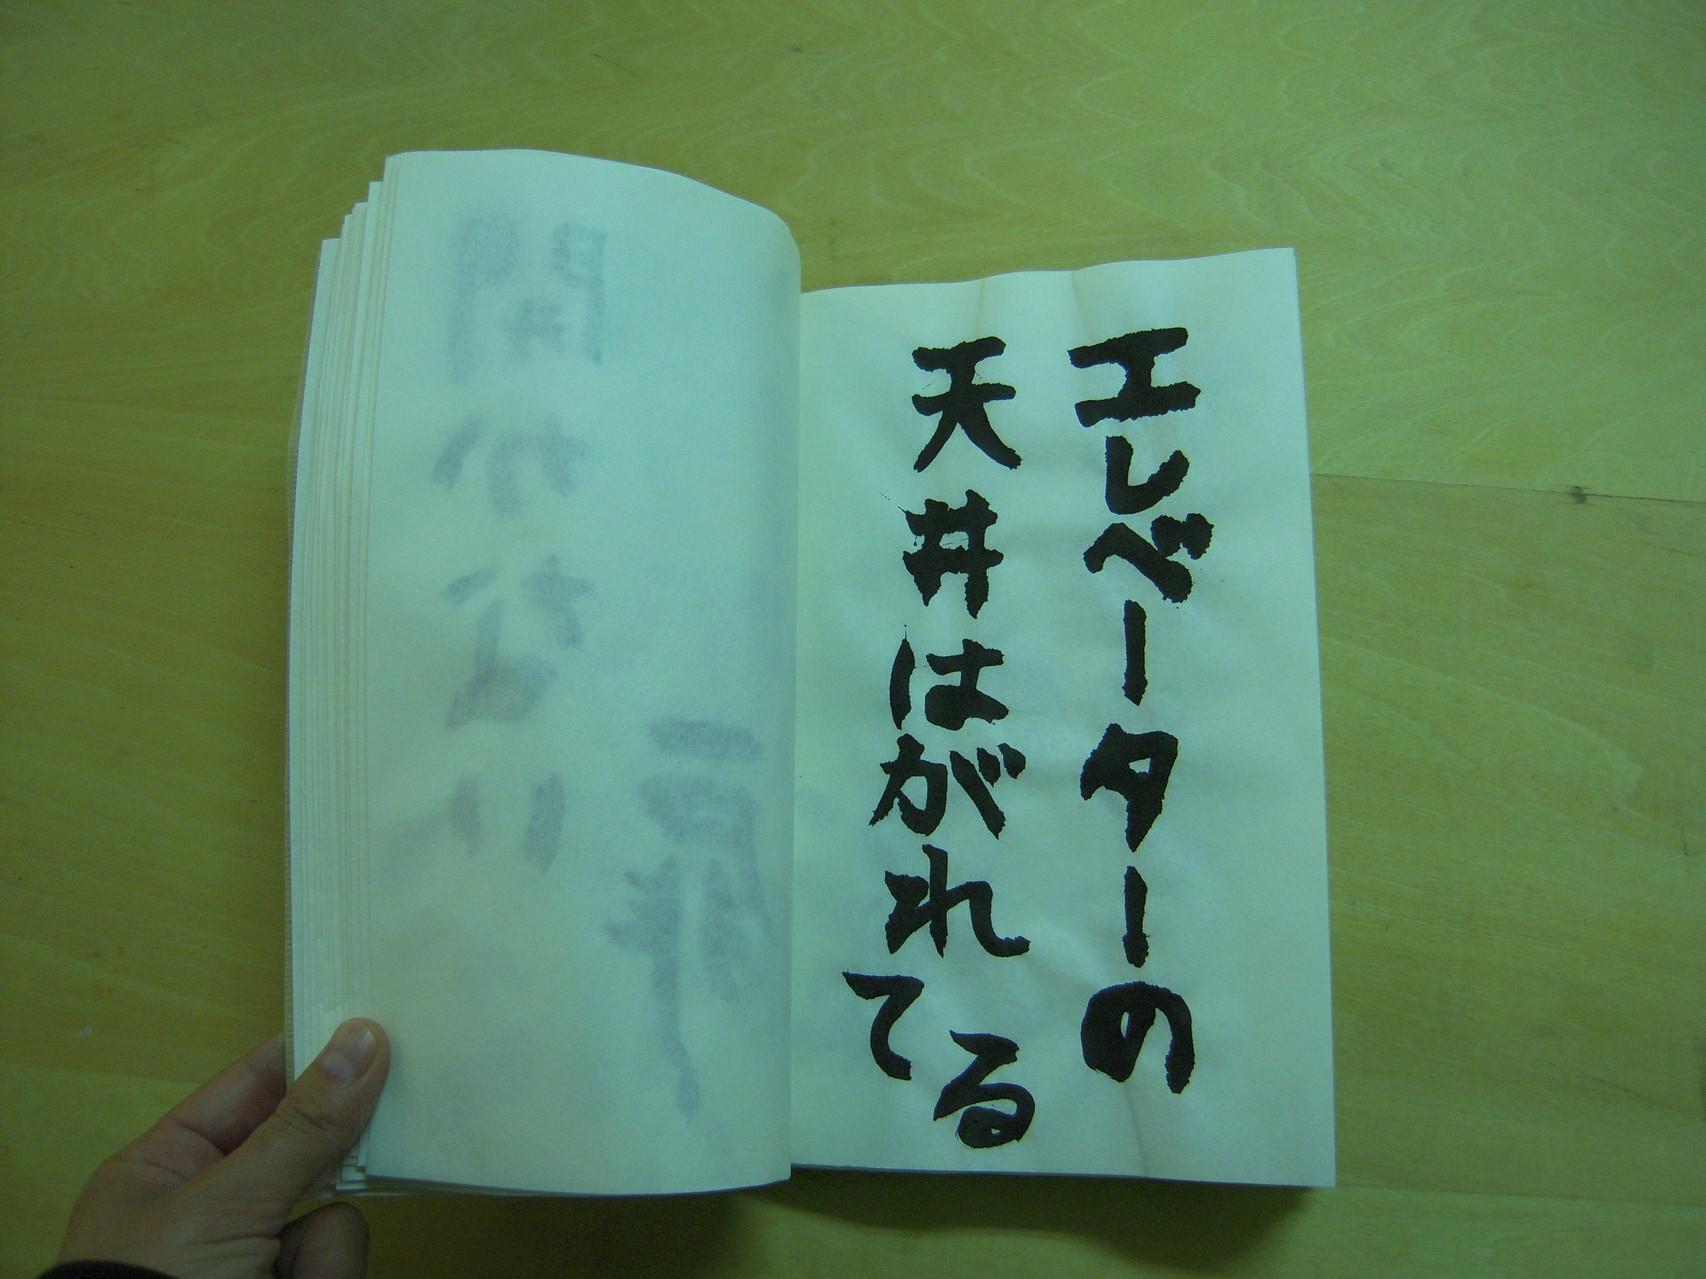 2012『ALAのナゾを集めて、ナゾ本作り!!』